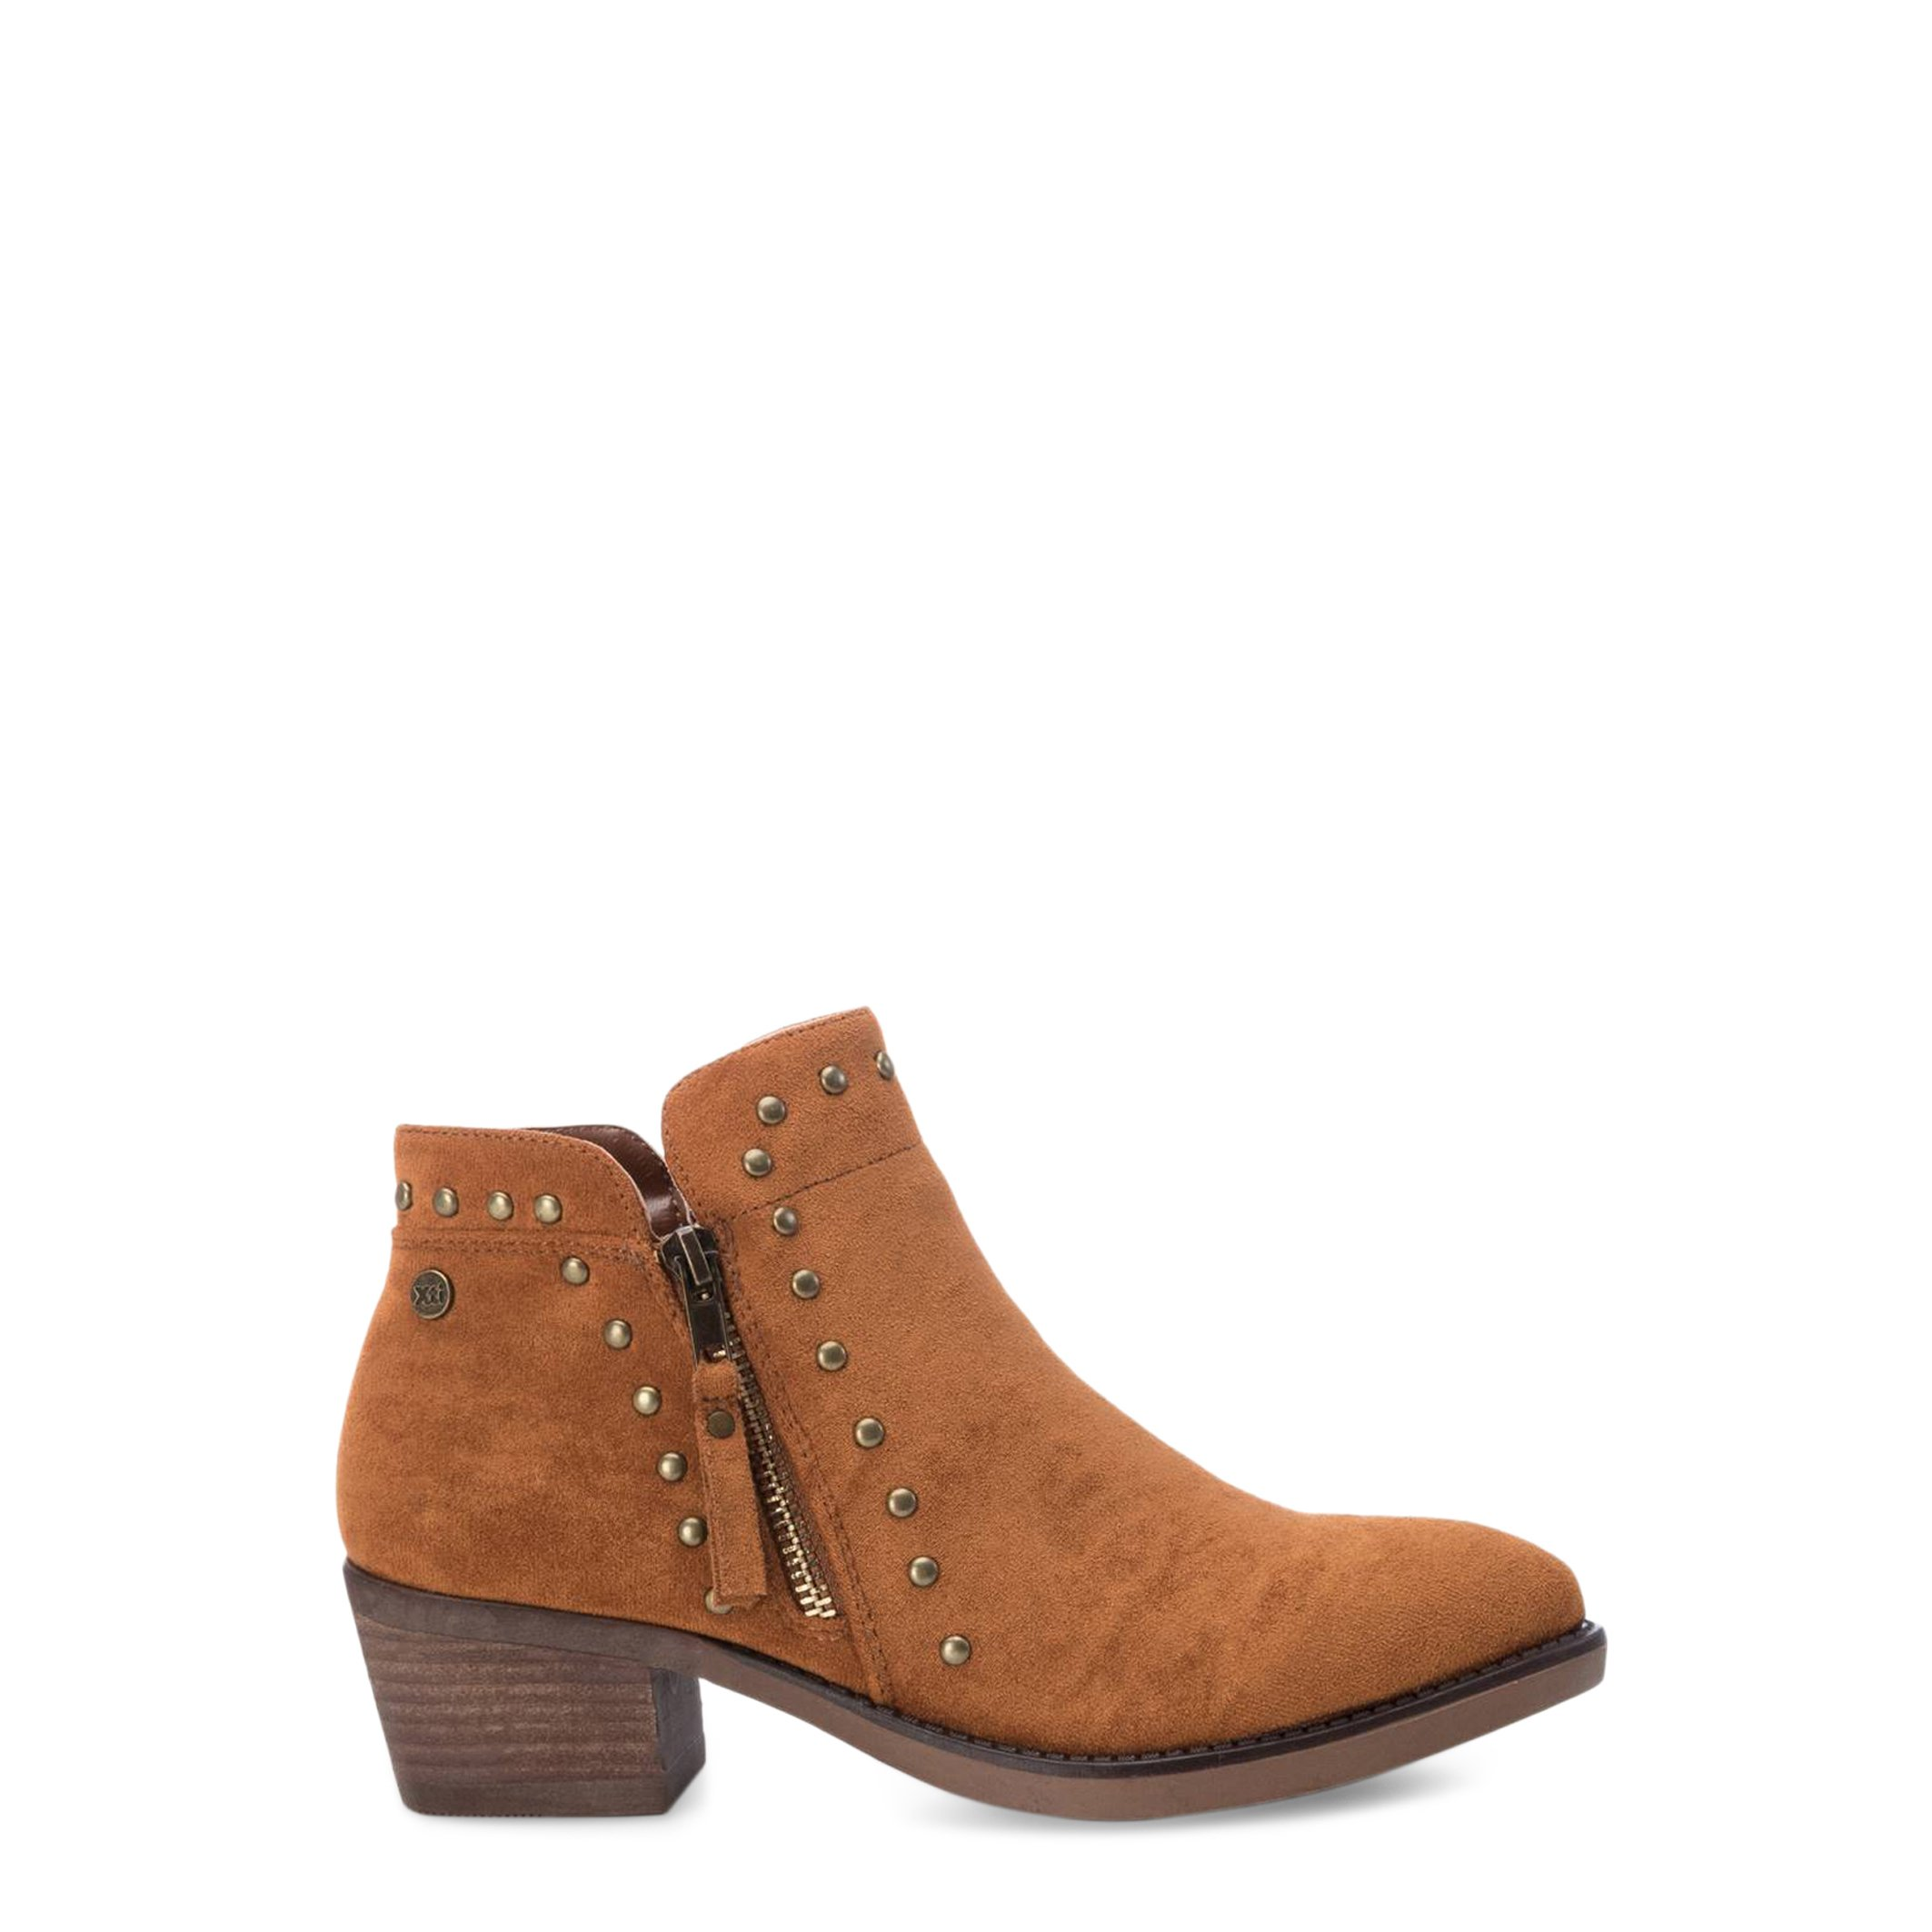 Xti Women's Ankle Boots Various Colors 49473 - brown EU 41